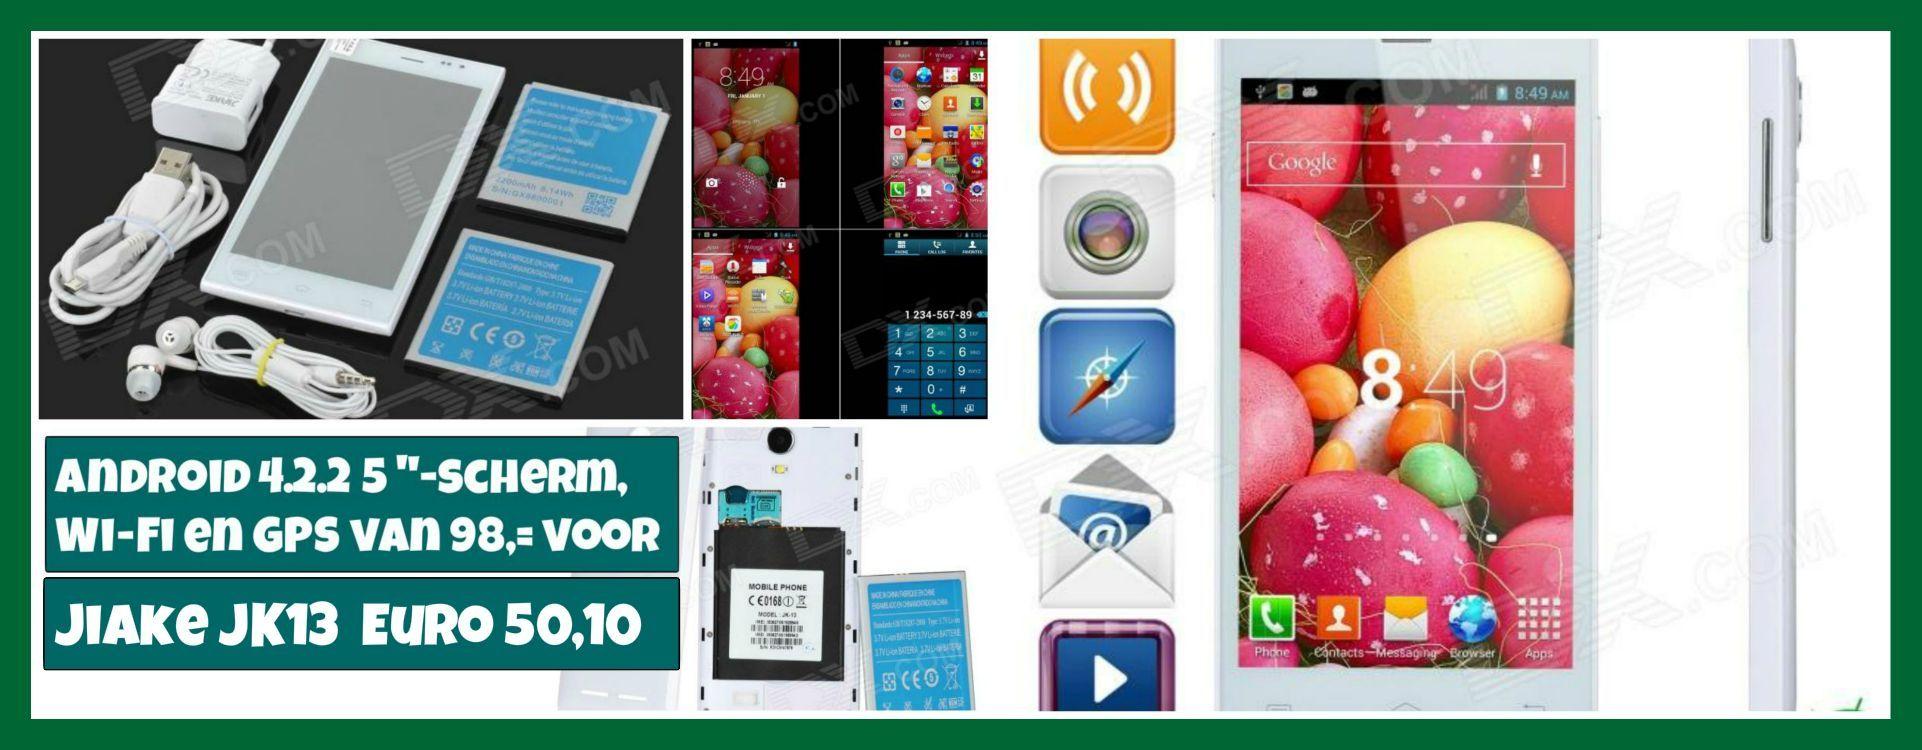 "Jiake JK13 Dual-core Android 4.2.2 WCDMA Bar MOBILE w / 5 ""-scherm, Wi-Fi en GPS - Wit van 98,= voor Euro 50,10"